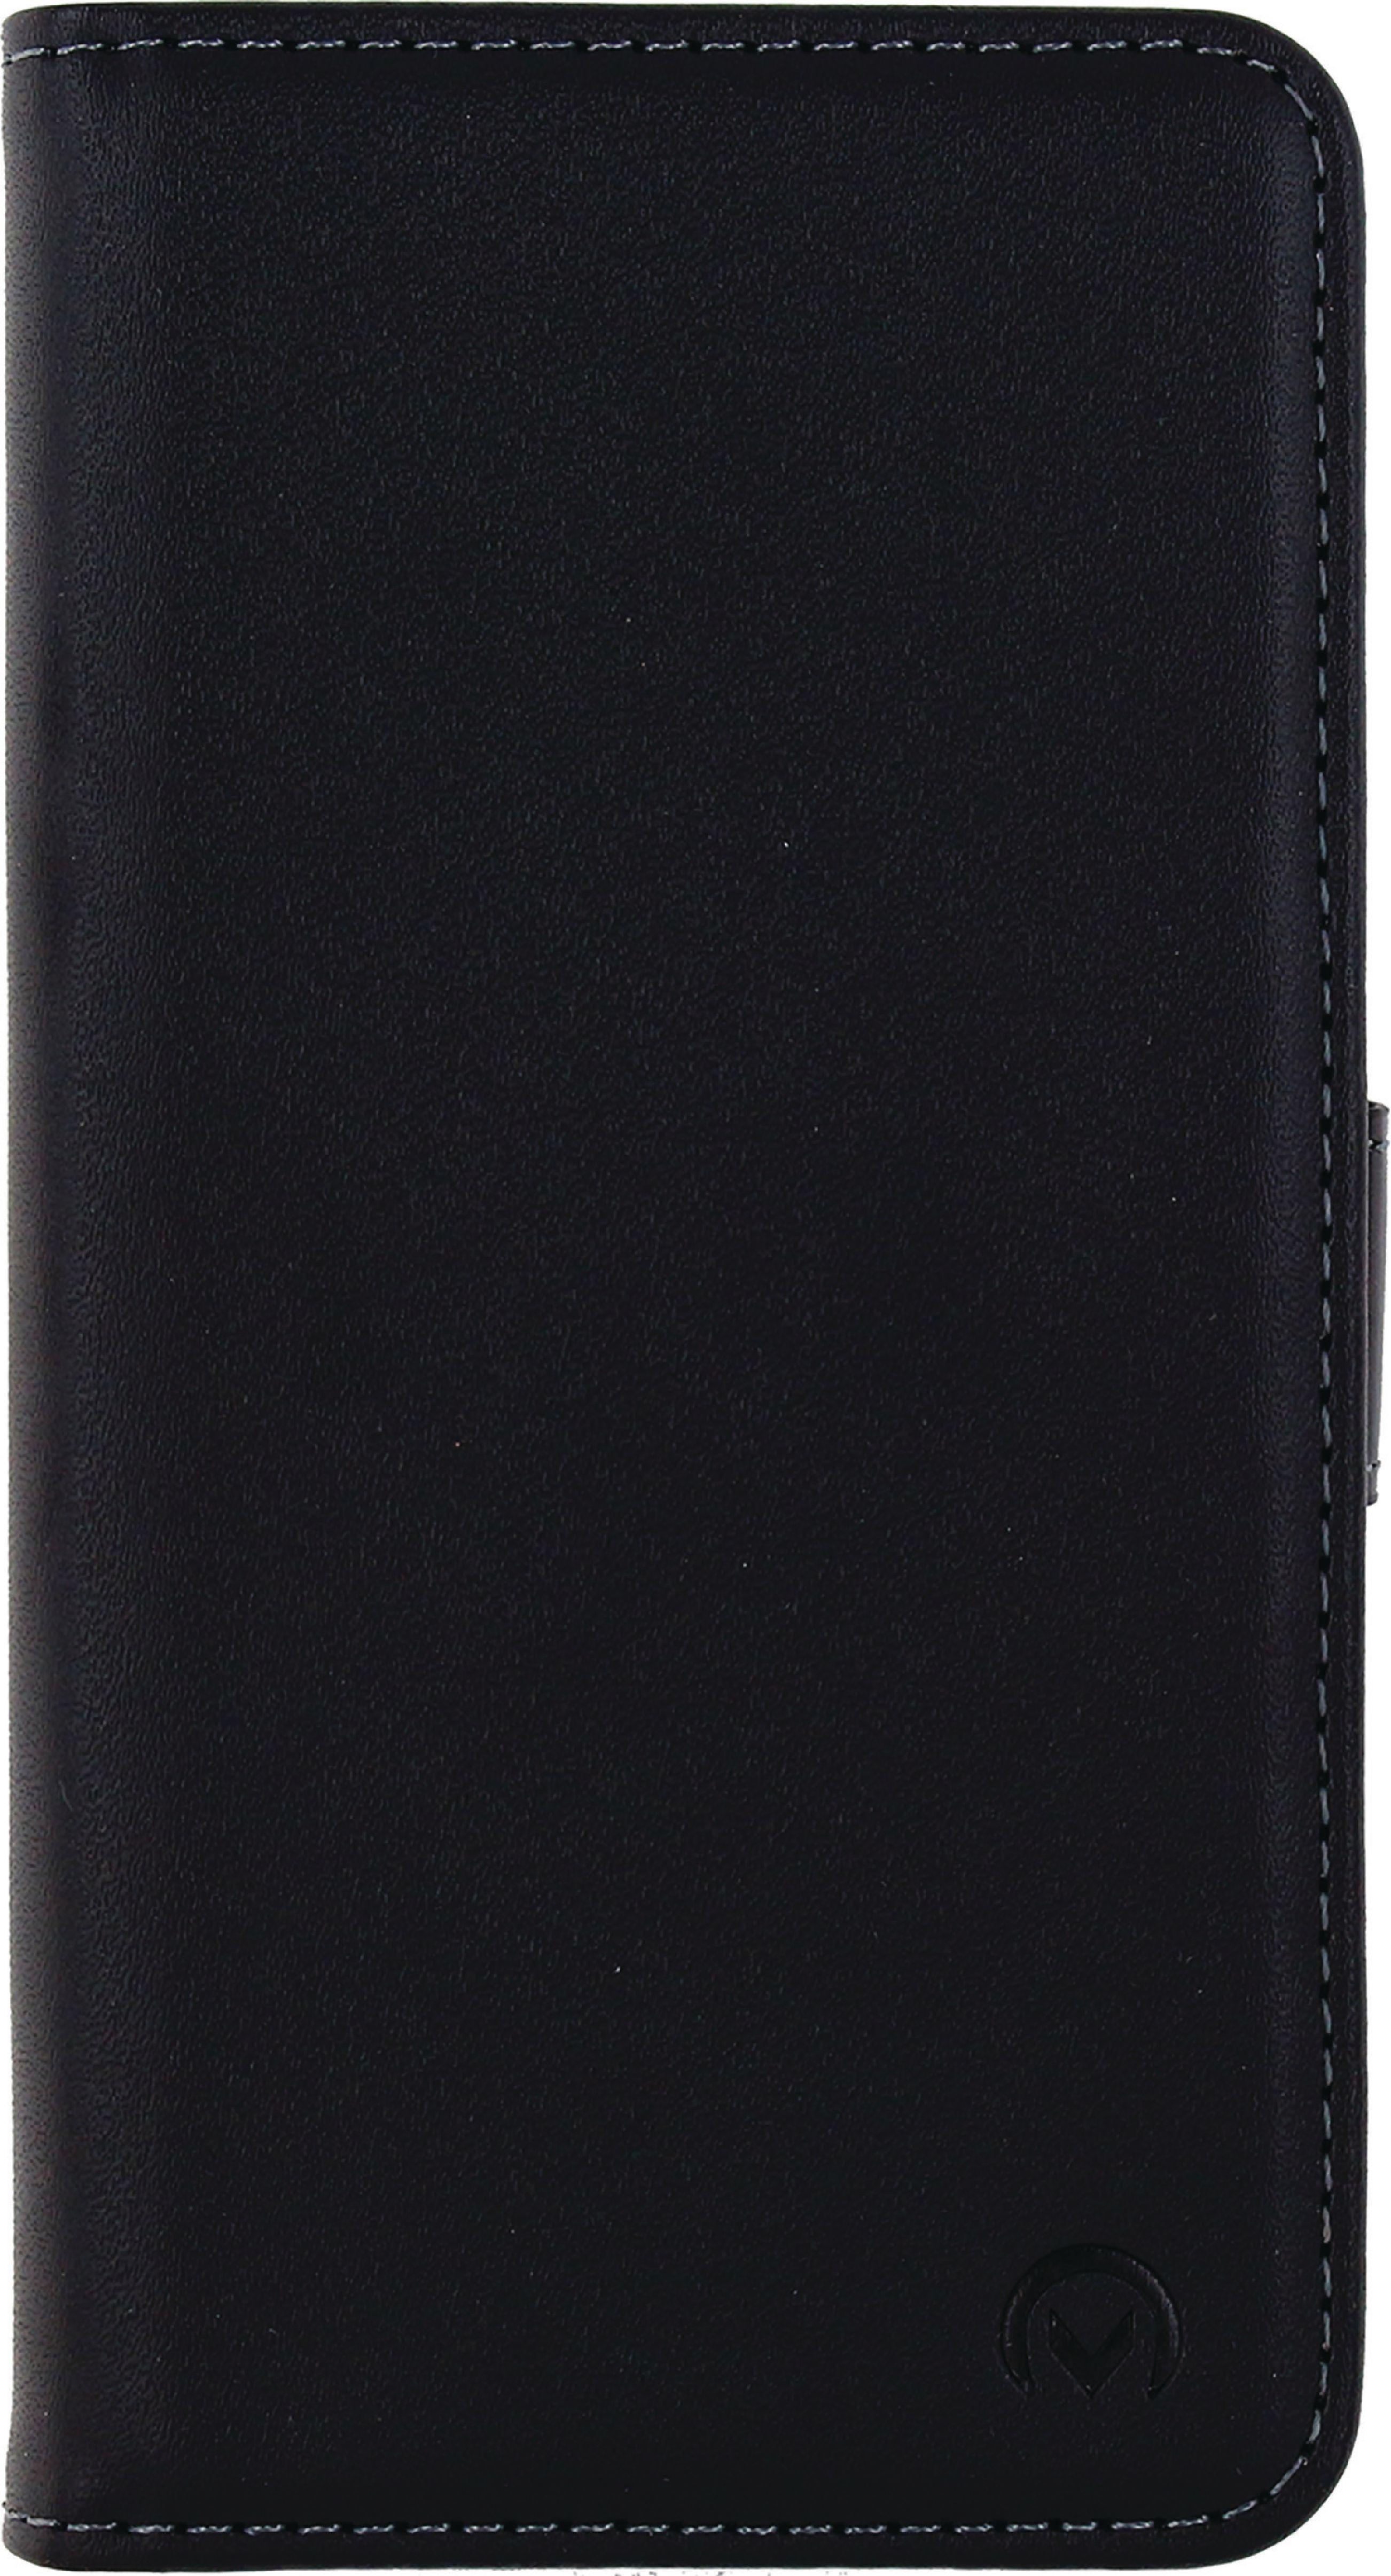 Image of   Telefon Gelly Lommebogsetui Samsung Galaxy S7 Edge Sort